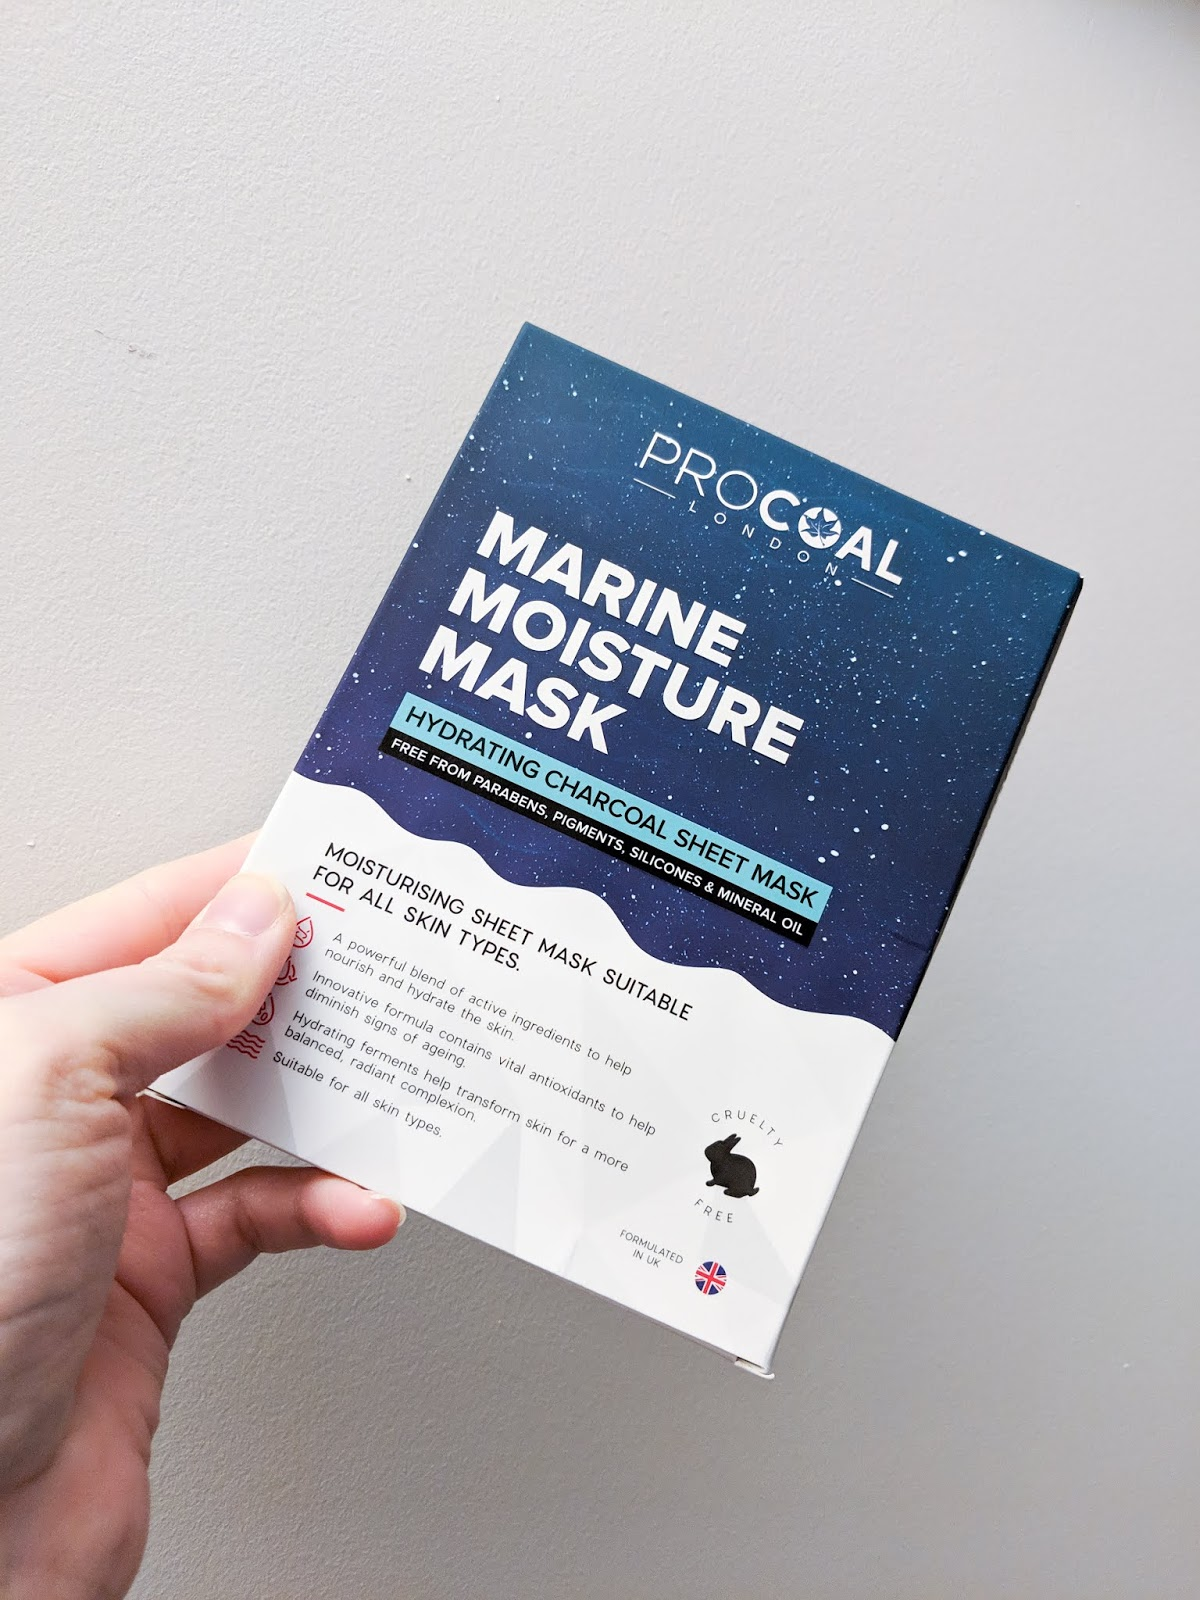 Procoal_marine_moisture_mask